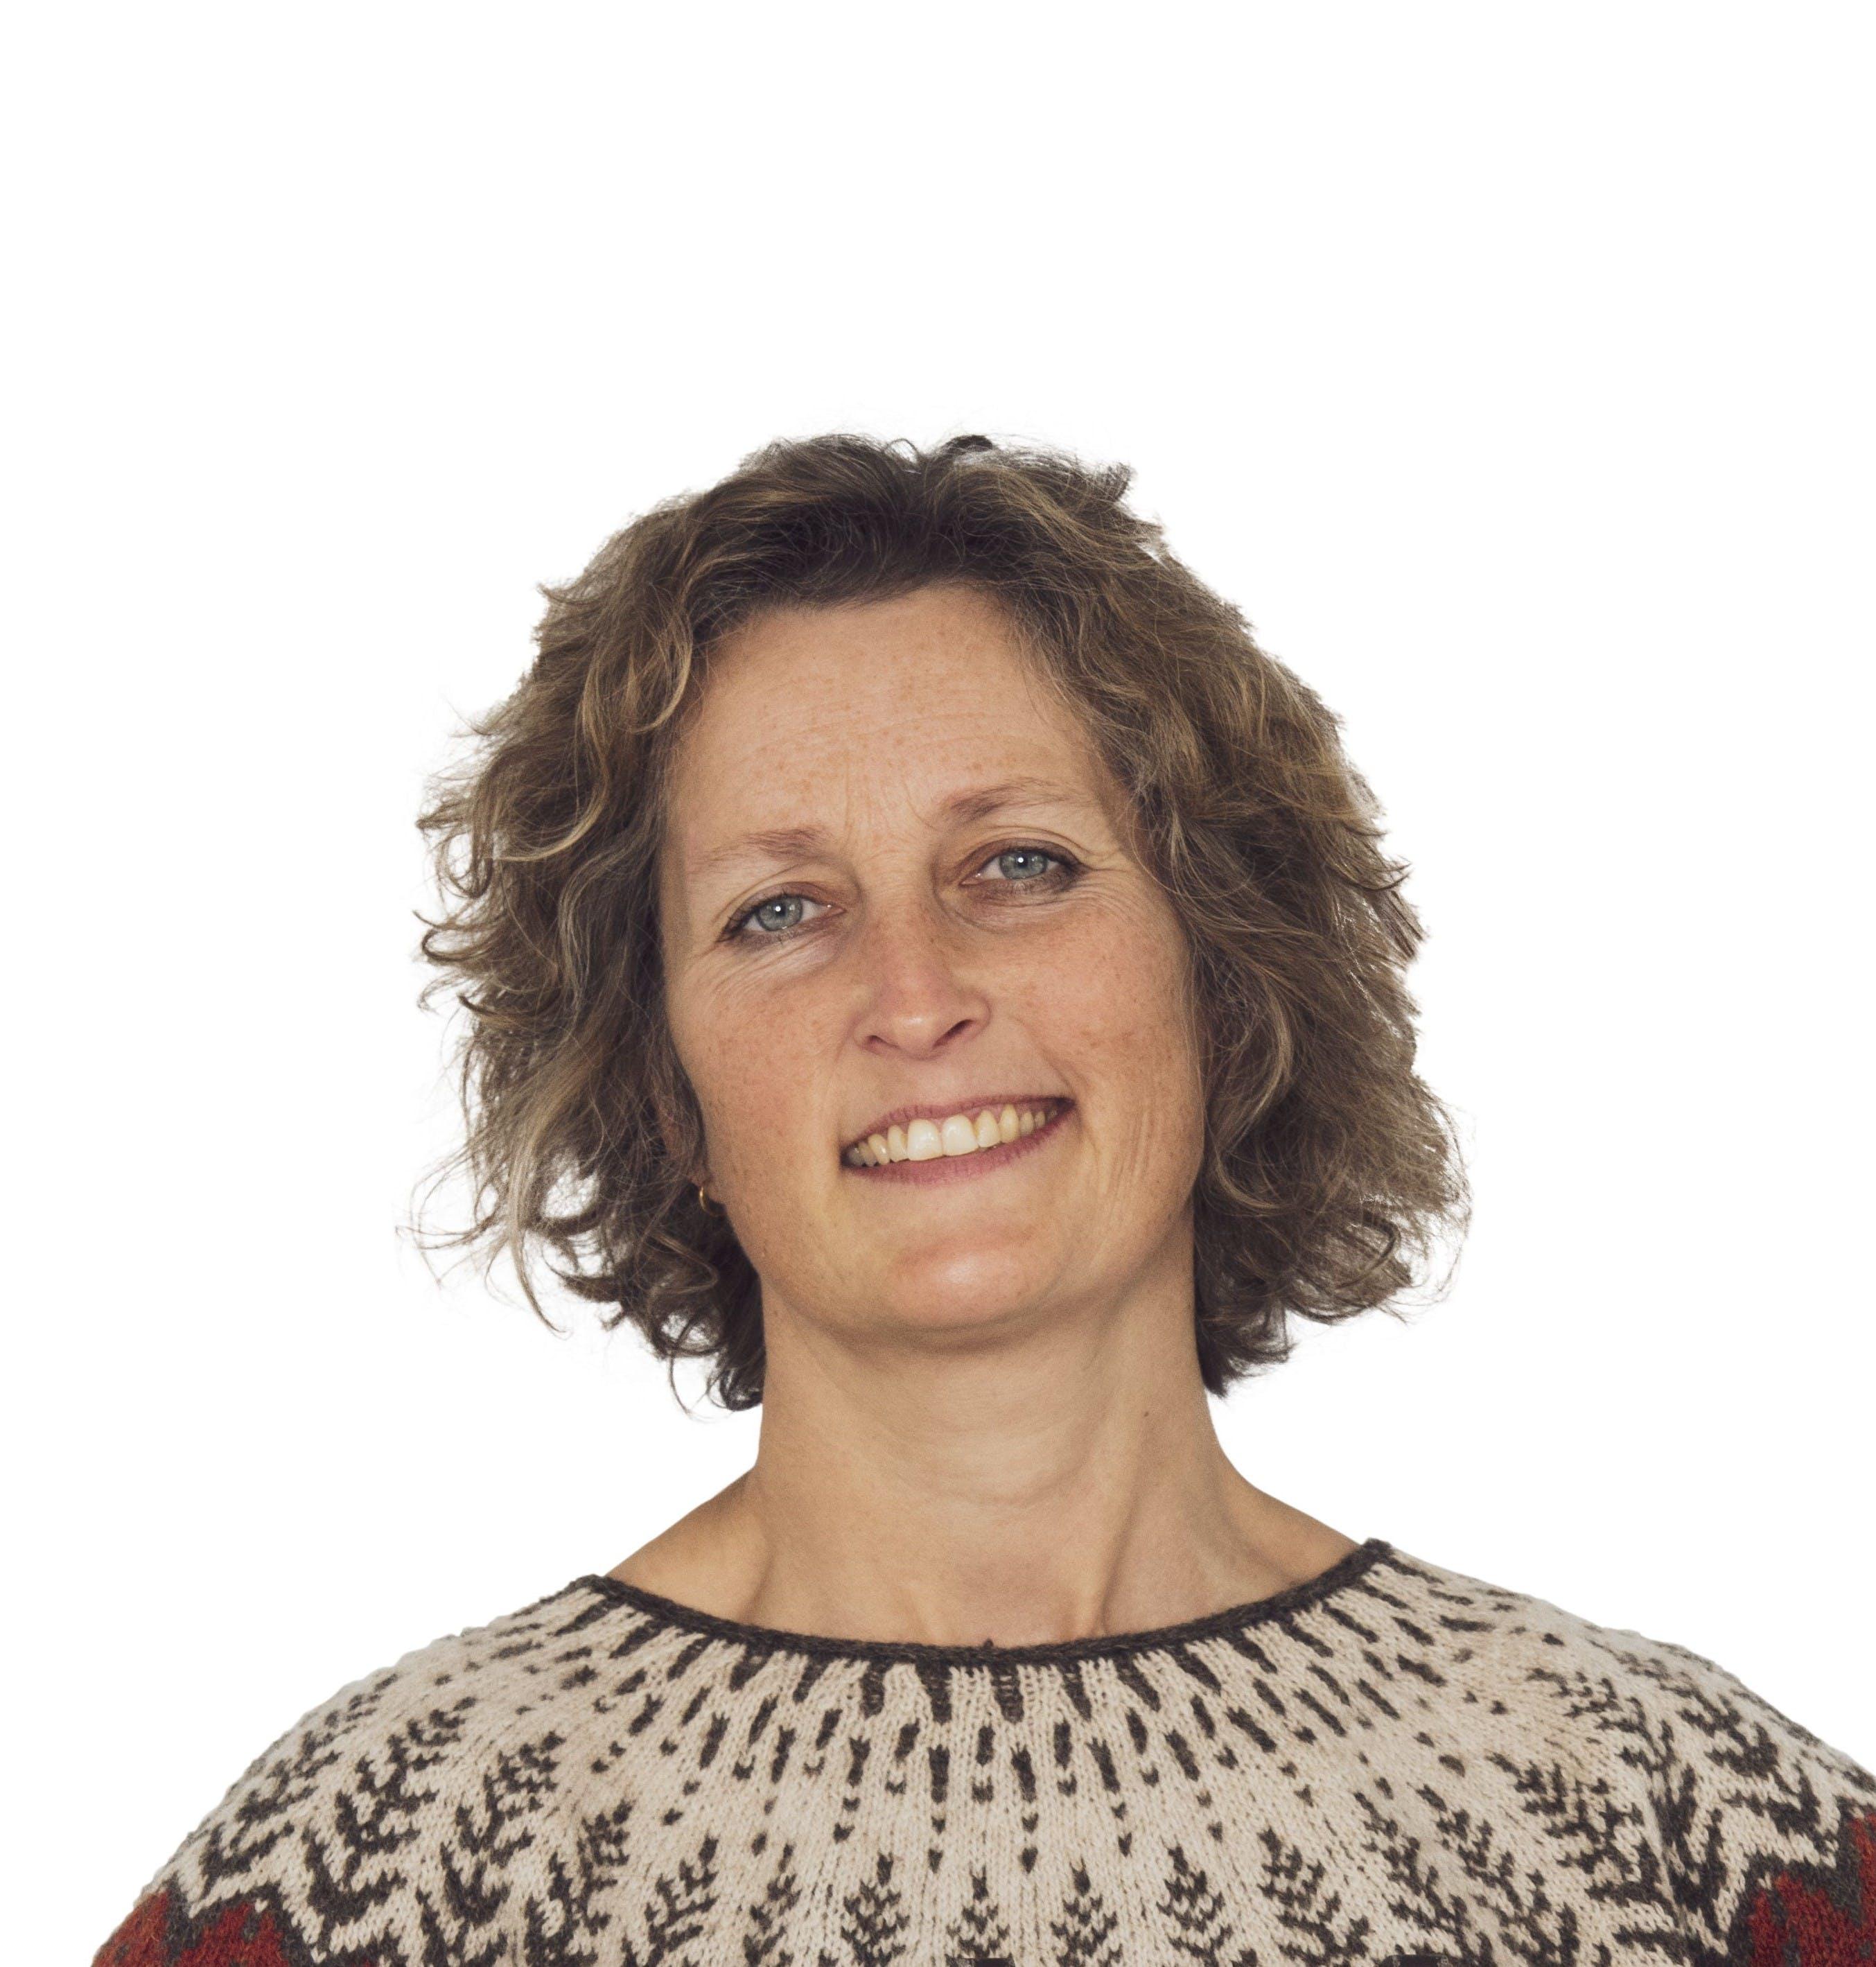 Fysioterapuet, ph.d. stud. Camilla Biering Lundquist, Dansk Selskab for Neurologisk Fysioterapi